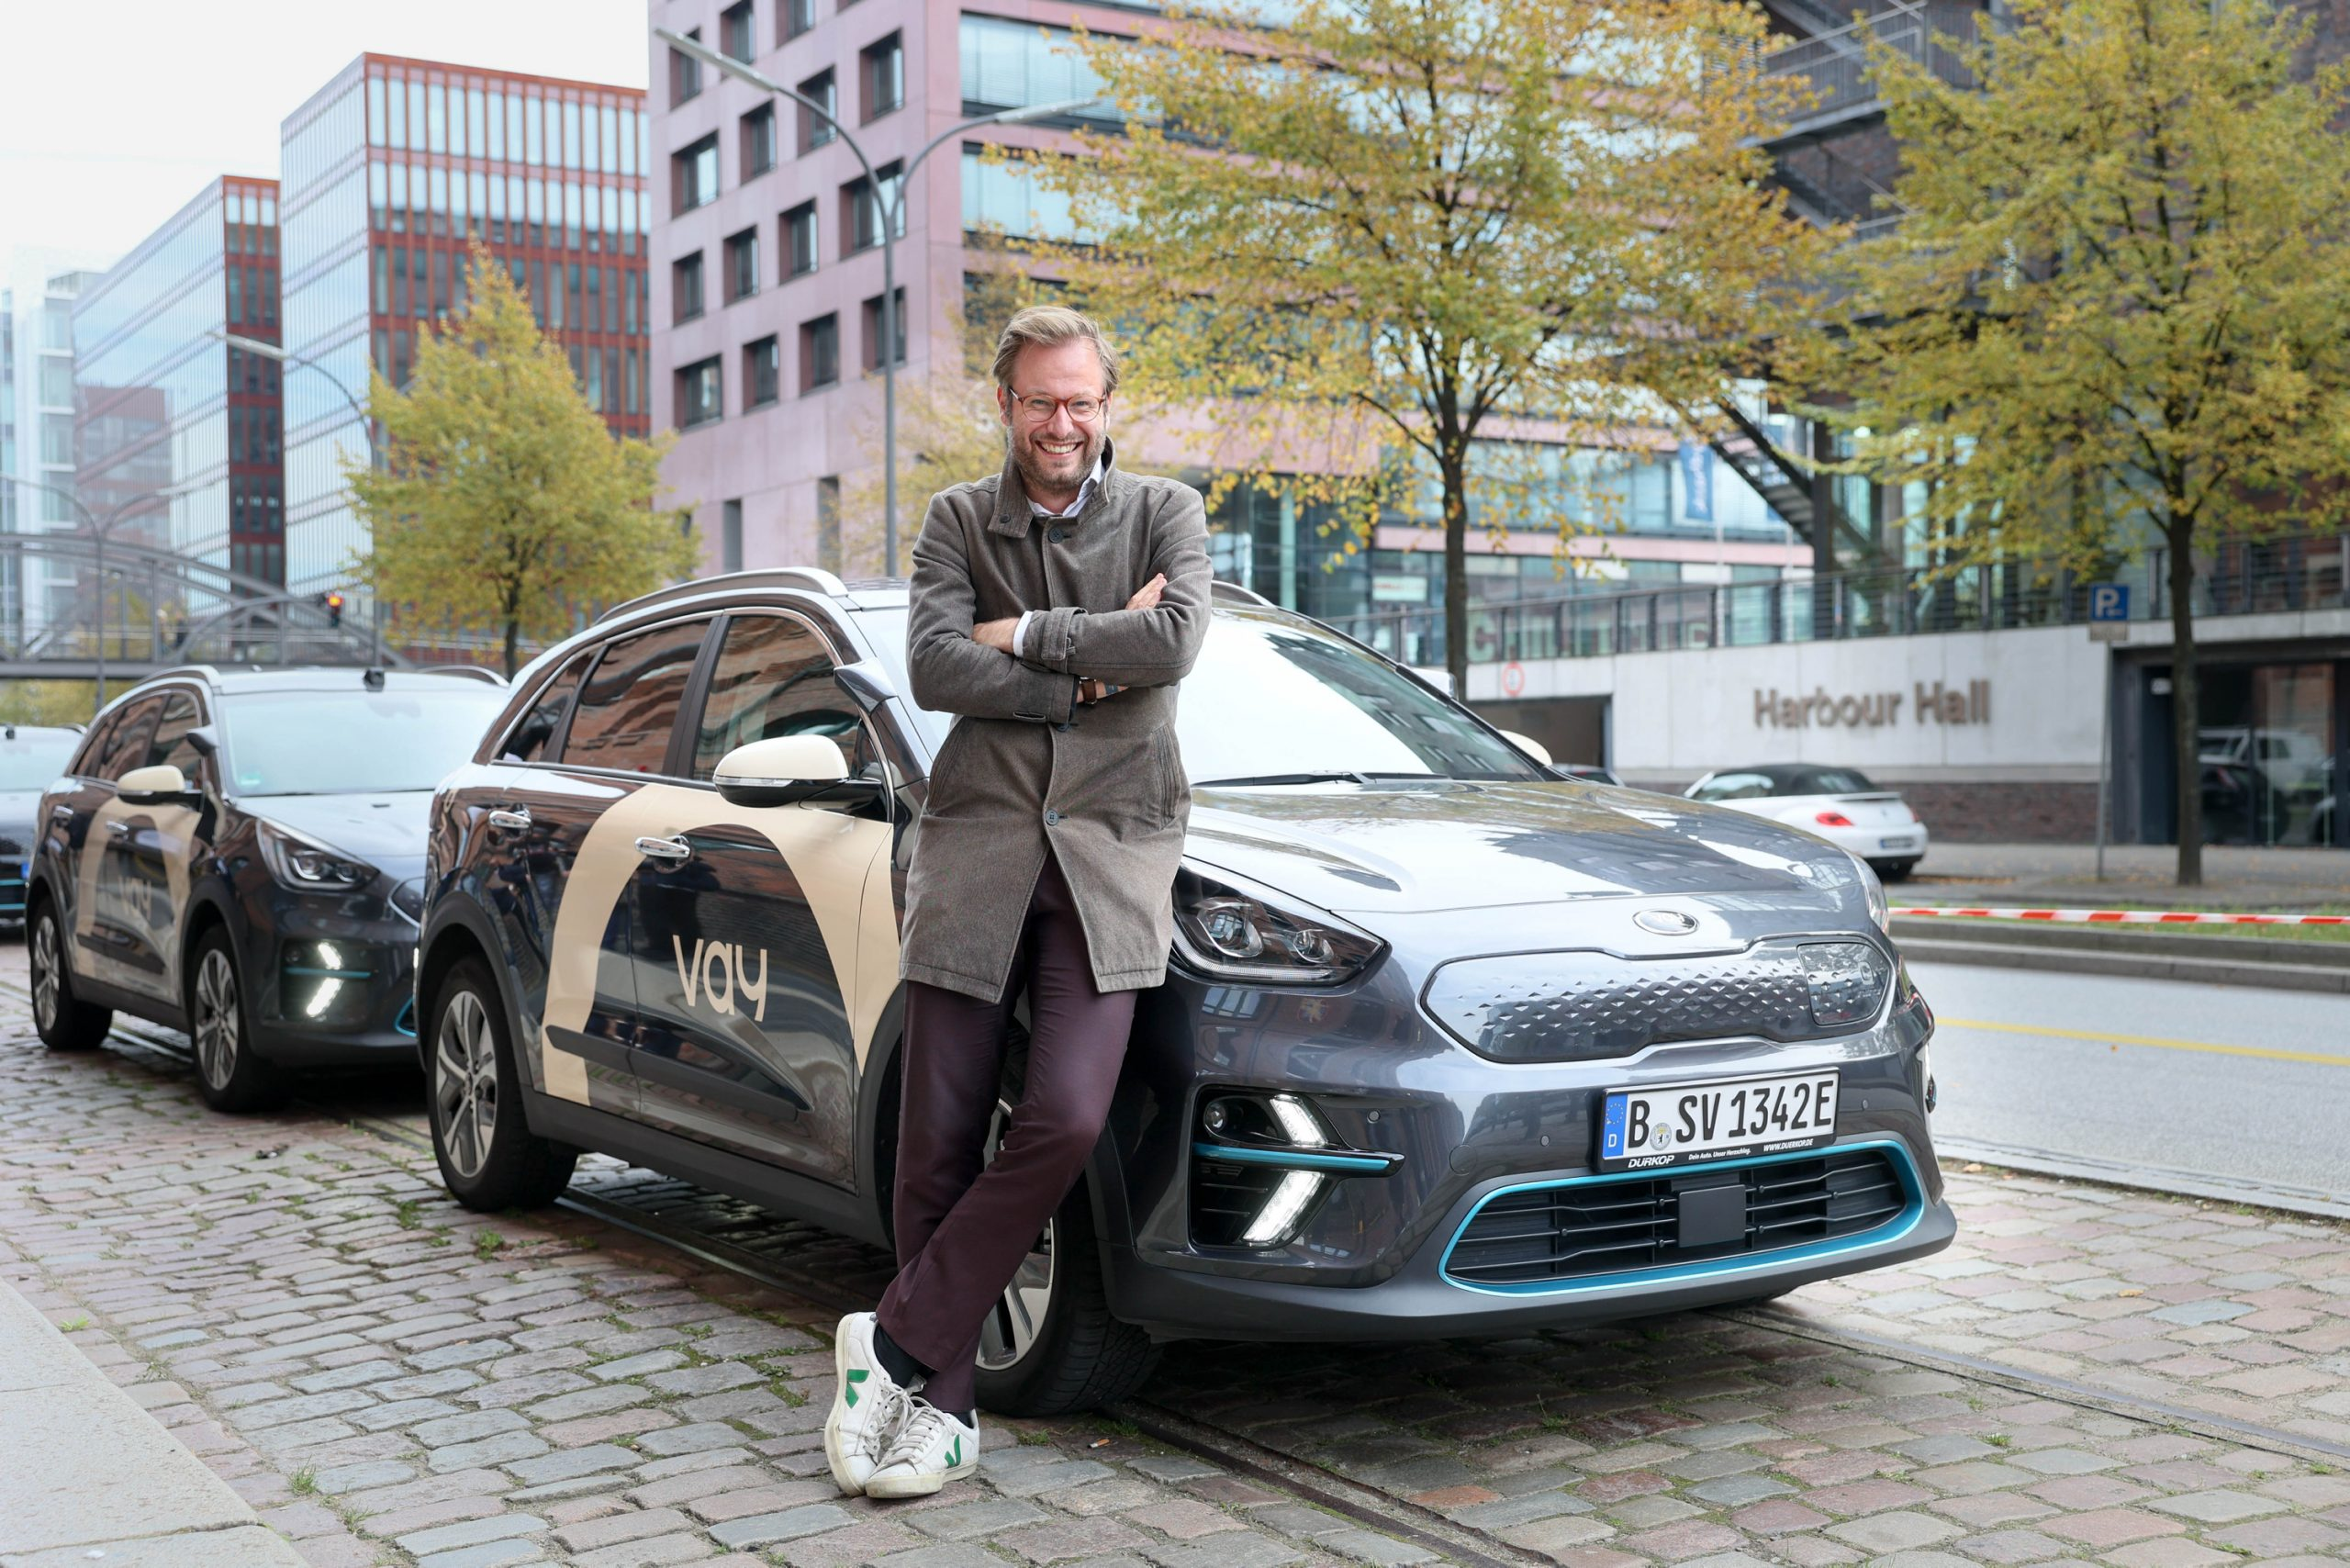 Verkehrssenator Anjes Tjarks (Grüne) vor den neuen Carsharing-Autos.